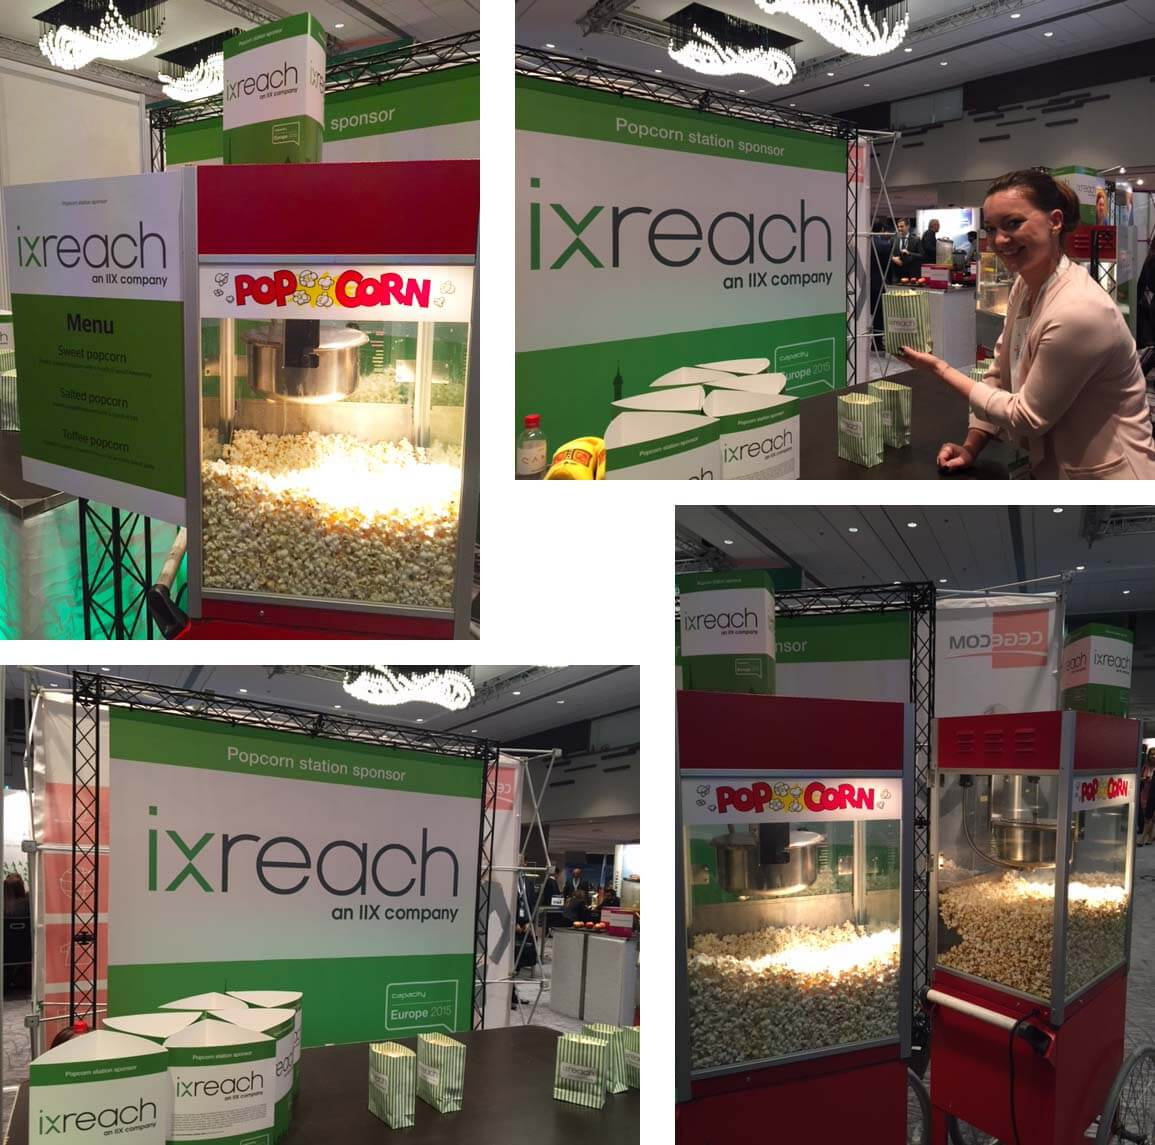 IX Reach popcorn stand